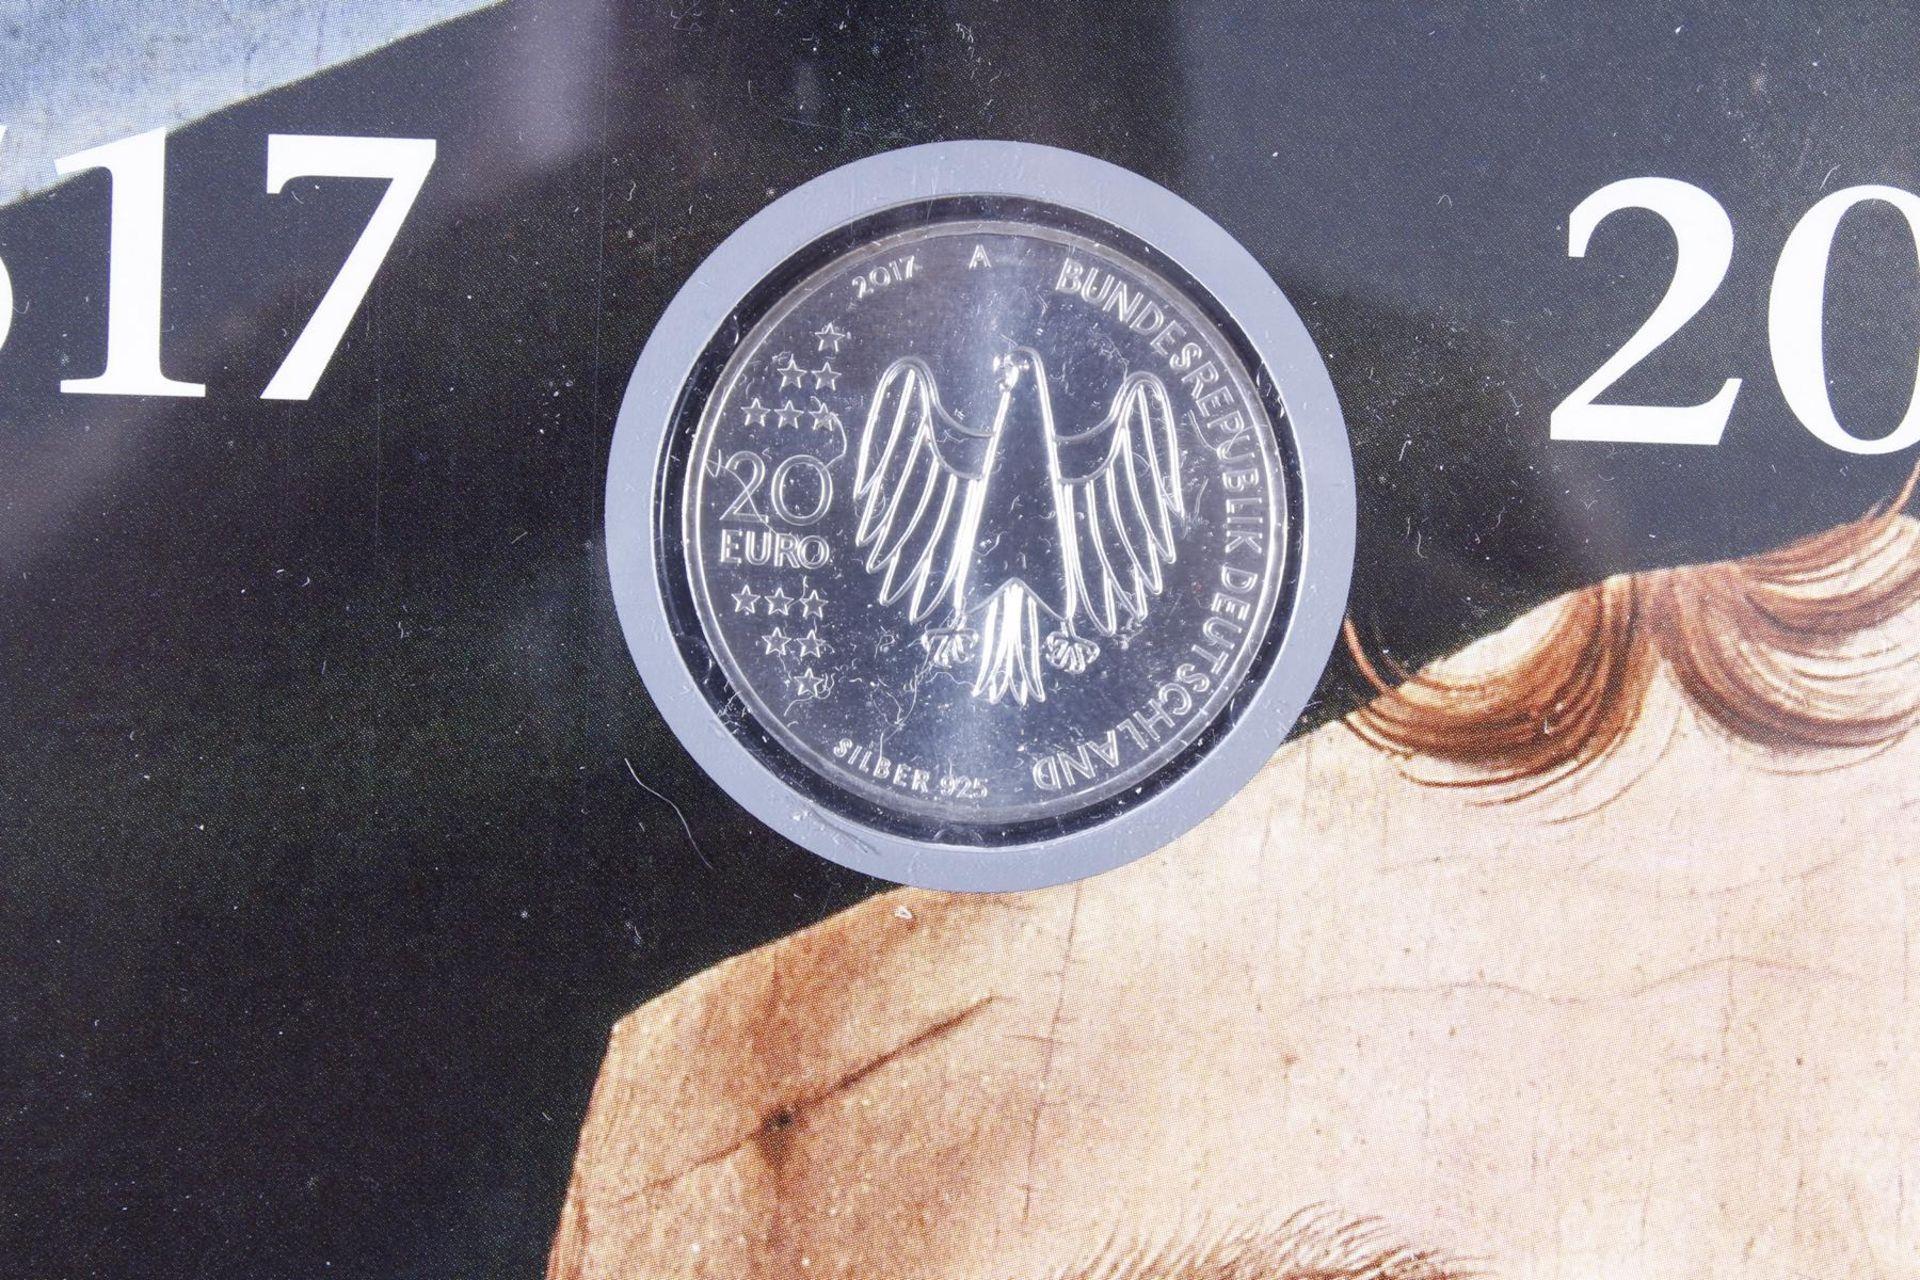 Münzsammlung Thema Vatikan / Kirche; inkl. Euro-Münzen - Bild 4 aus 4